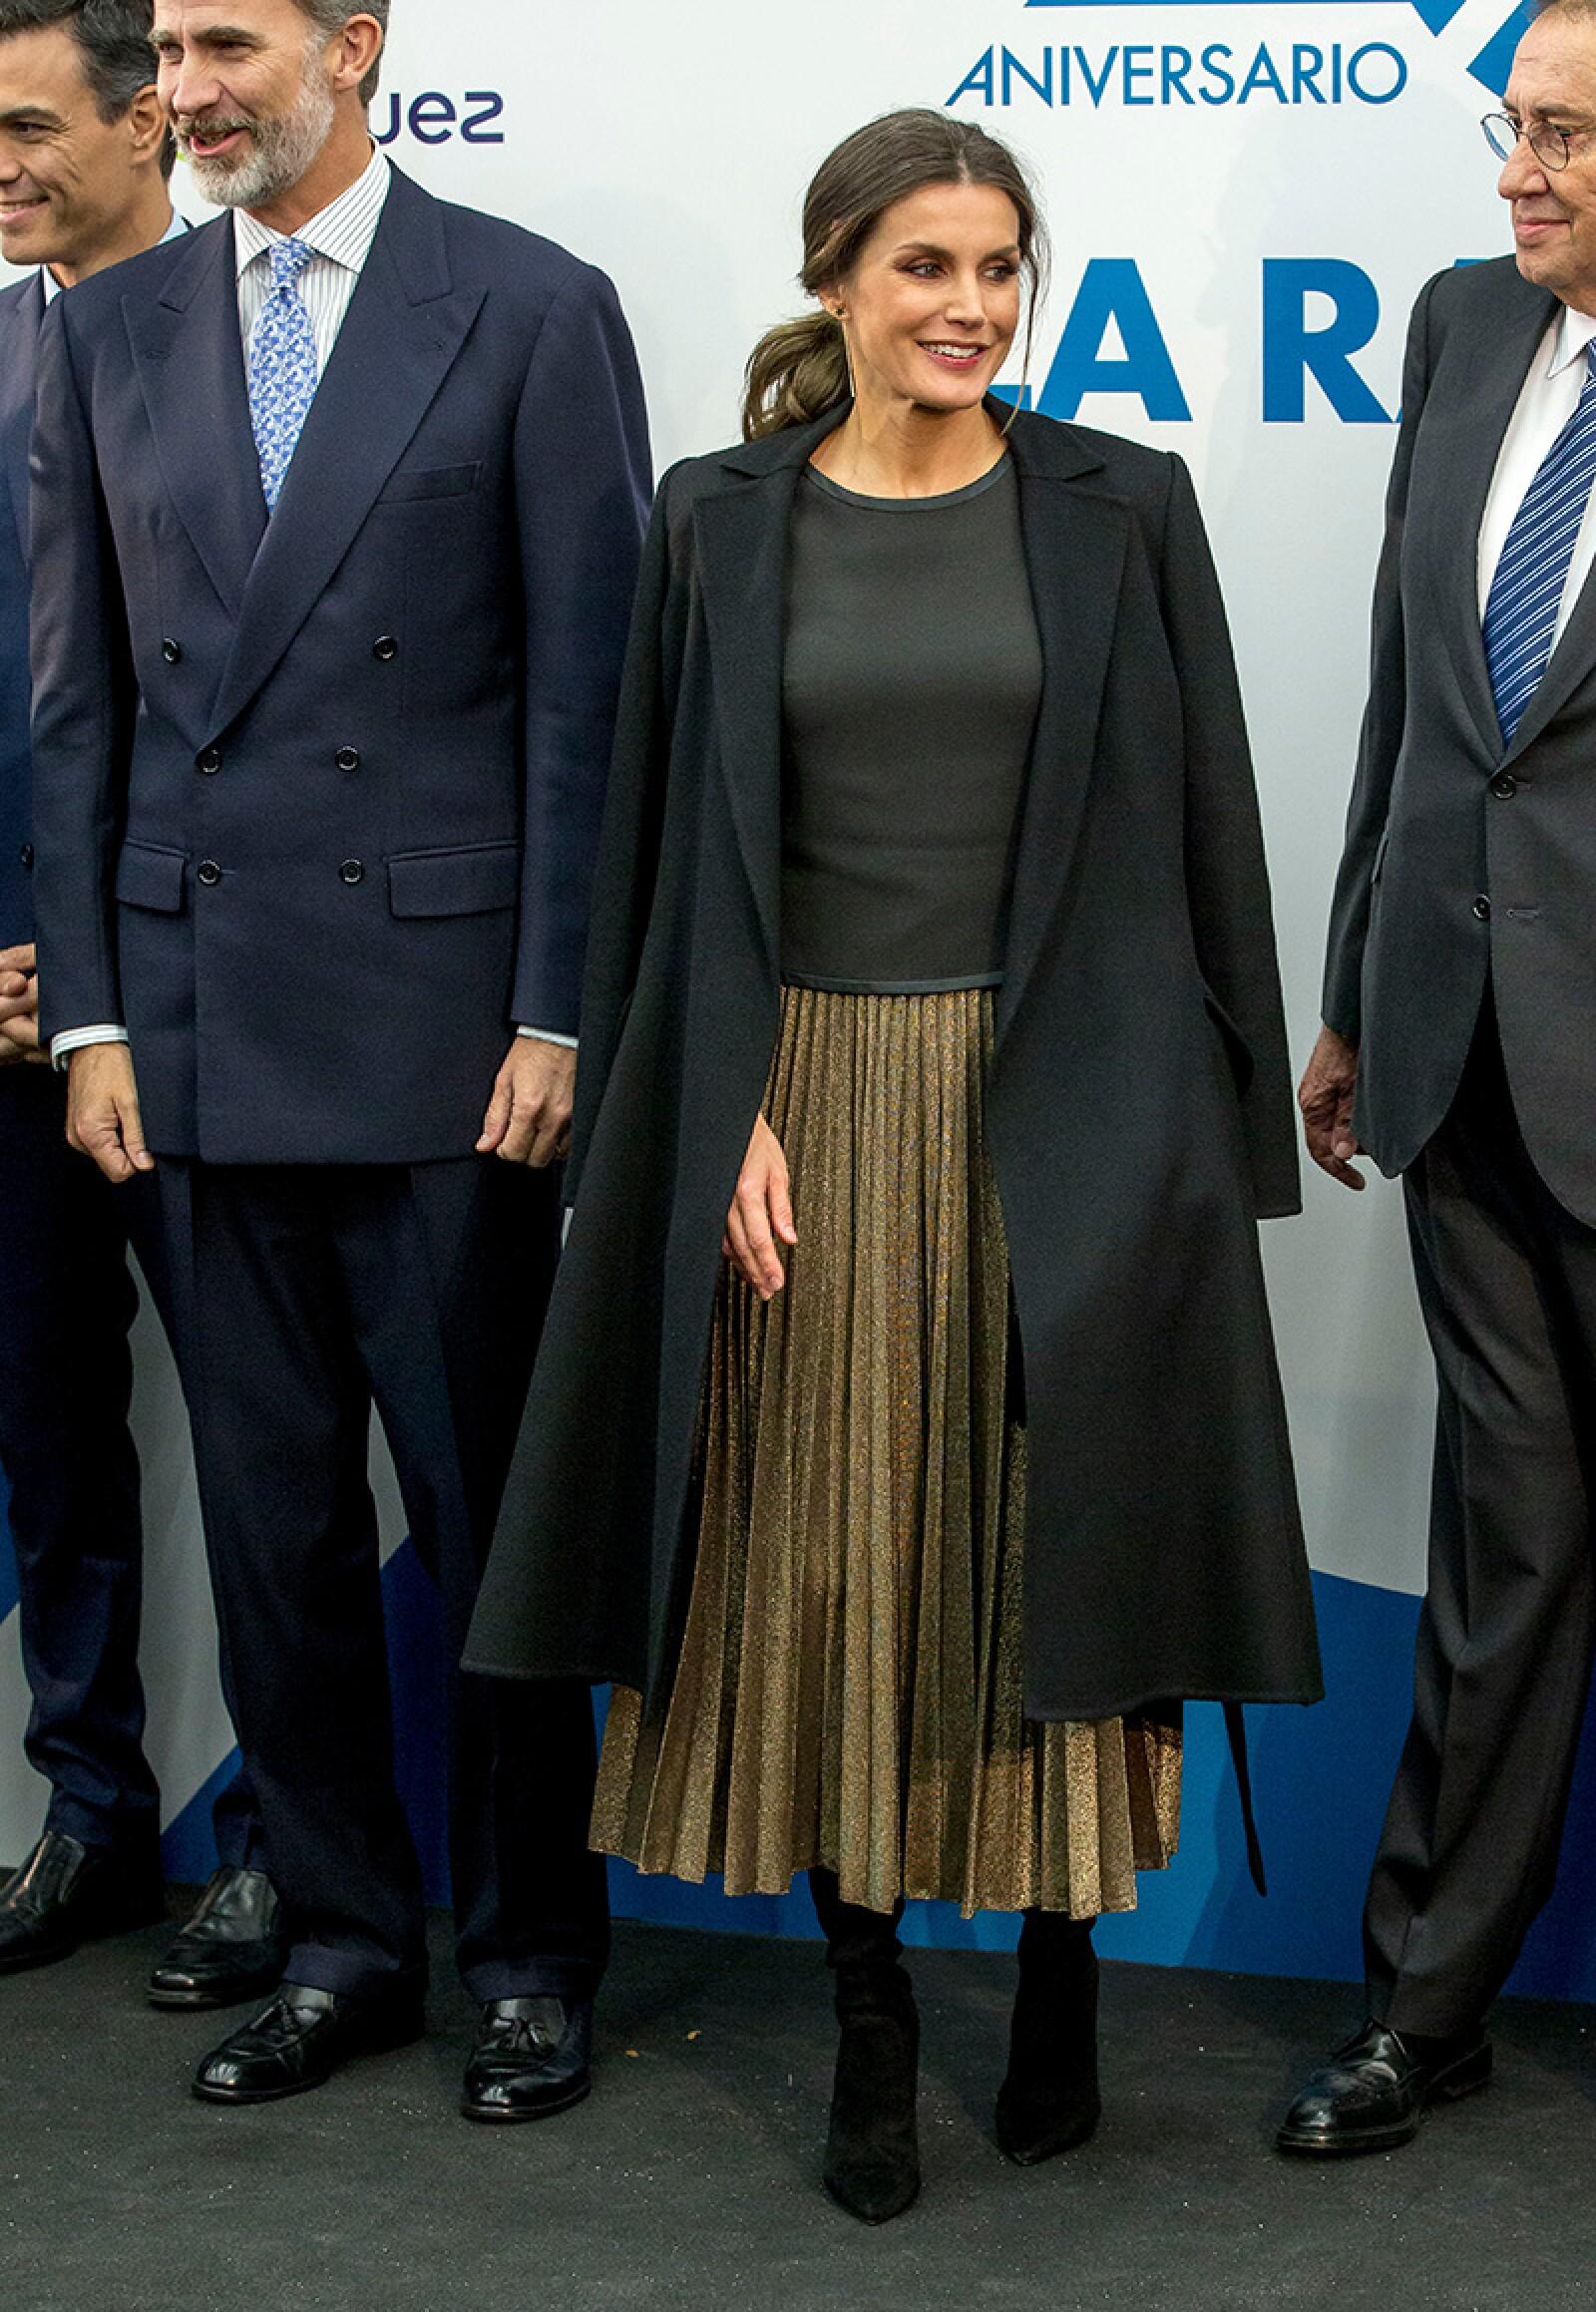 'La Razon' newspaper 20th anniversary celebration, Madrid, Spain - 05 Nov 2018